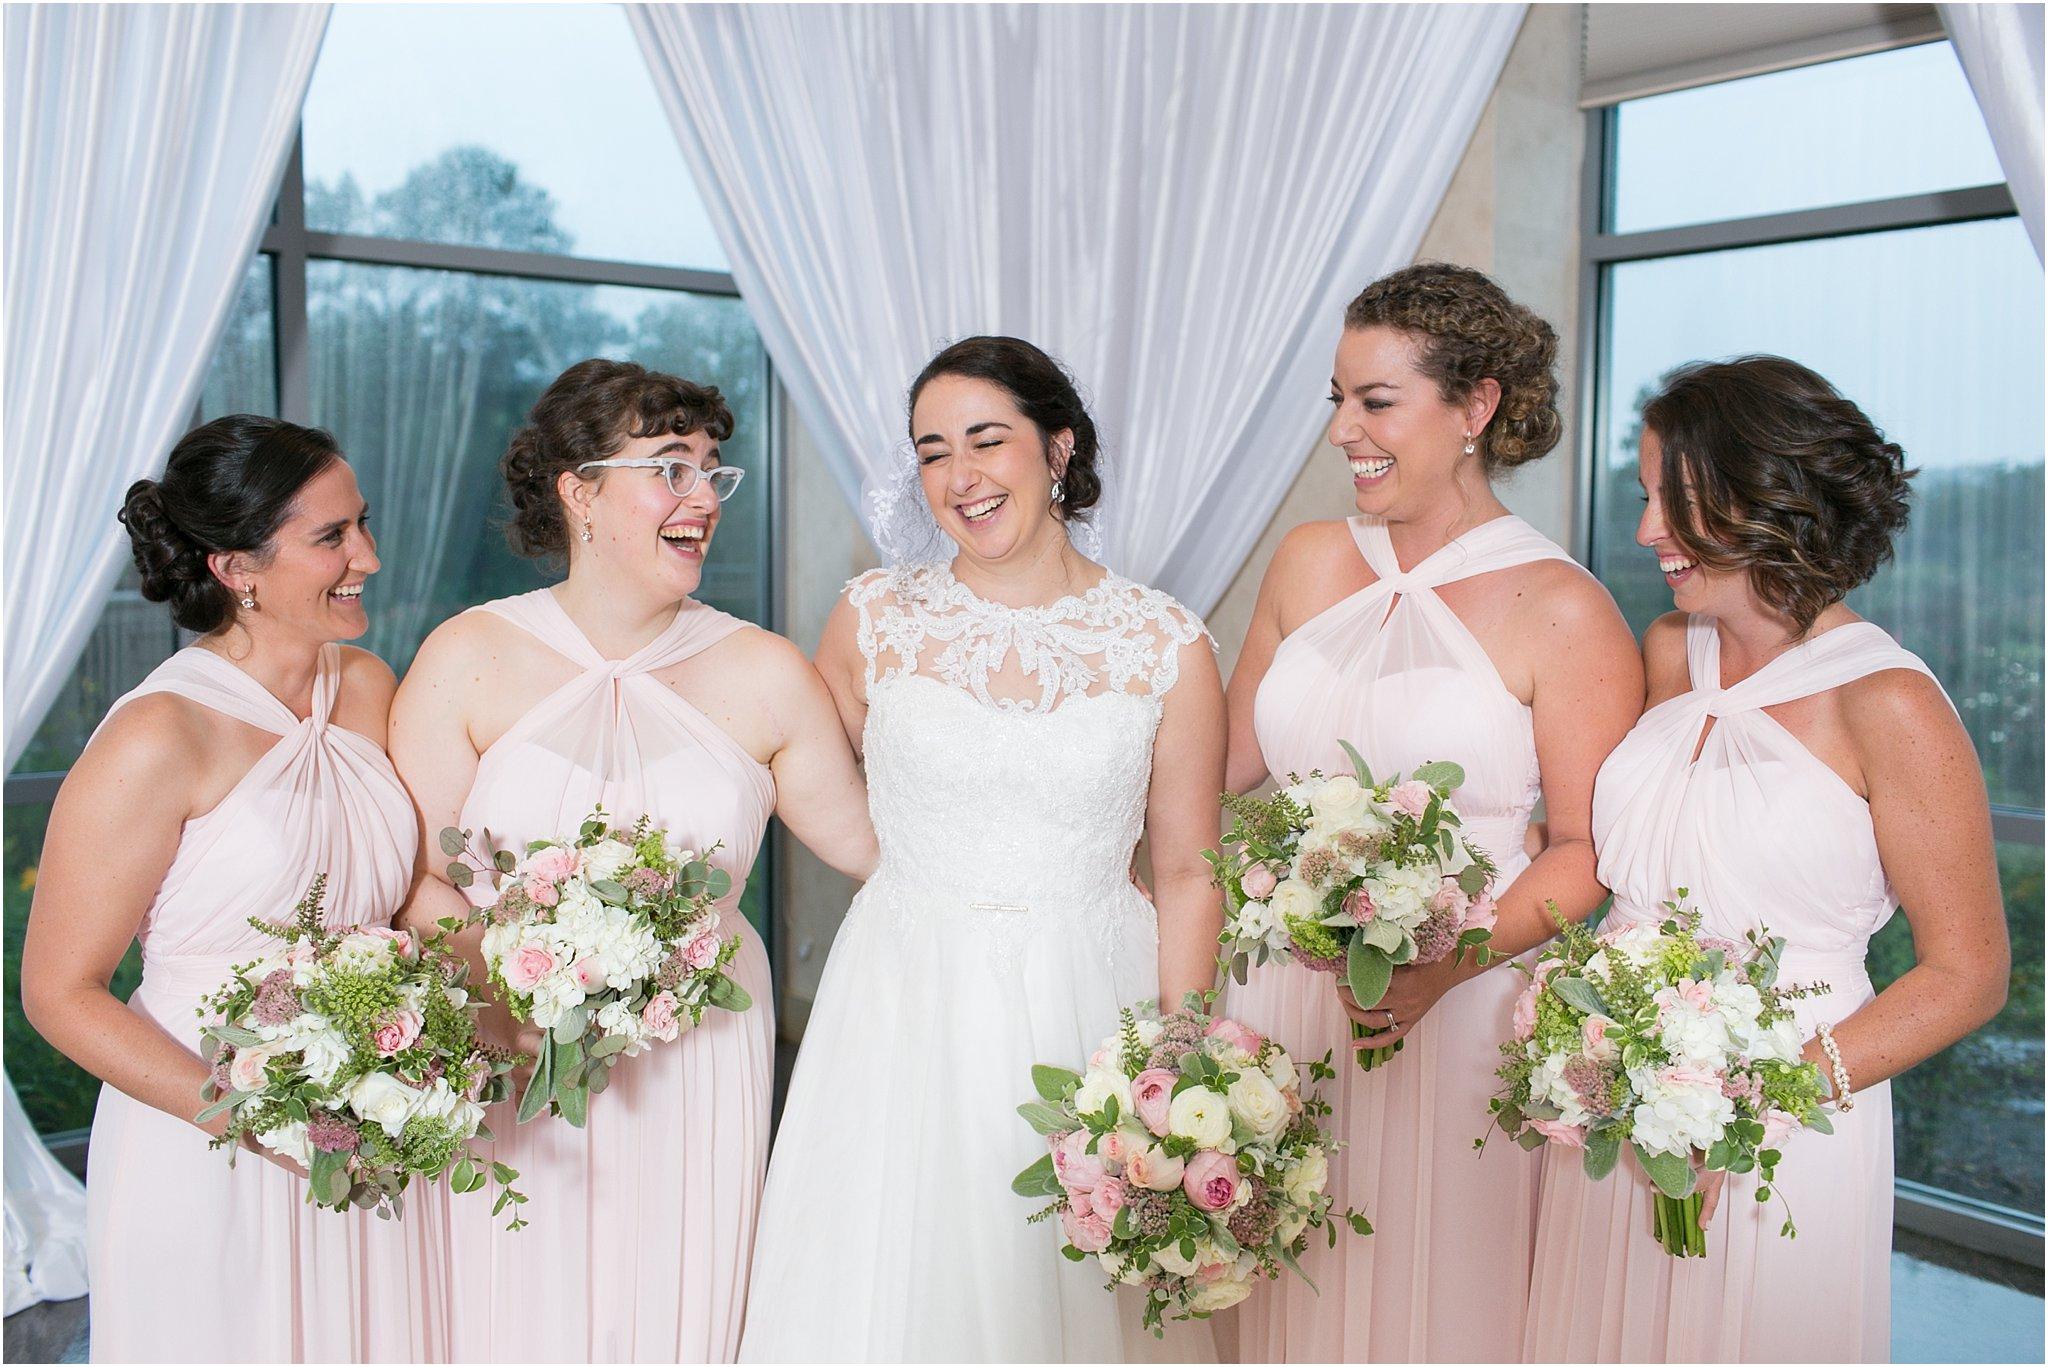 jessica_ryan_photography_virginia_wedding_photographer_wedding_hurricane_norfolk_botanical_gardens_hurricane_matthew_wedding_3583